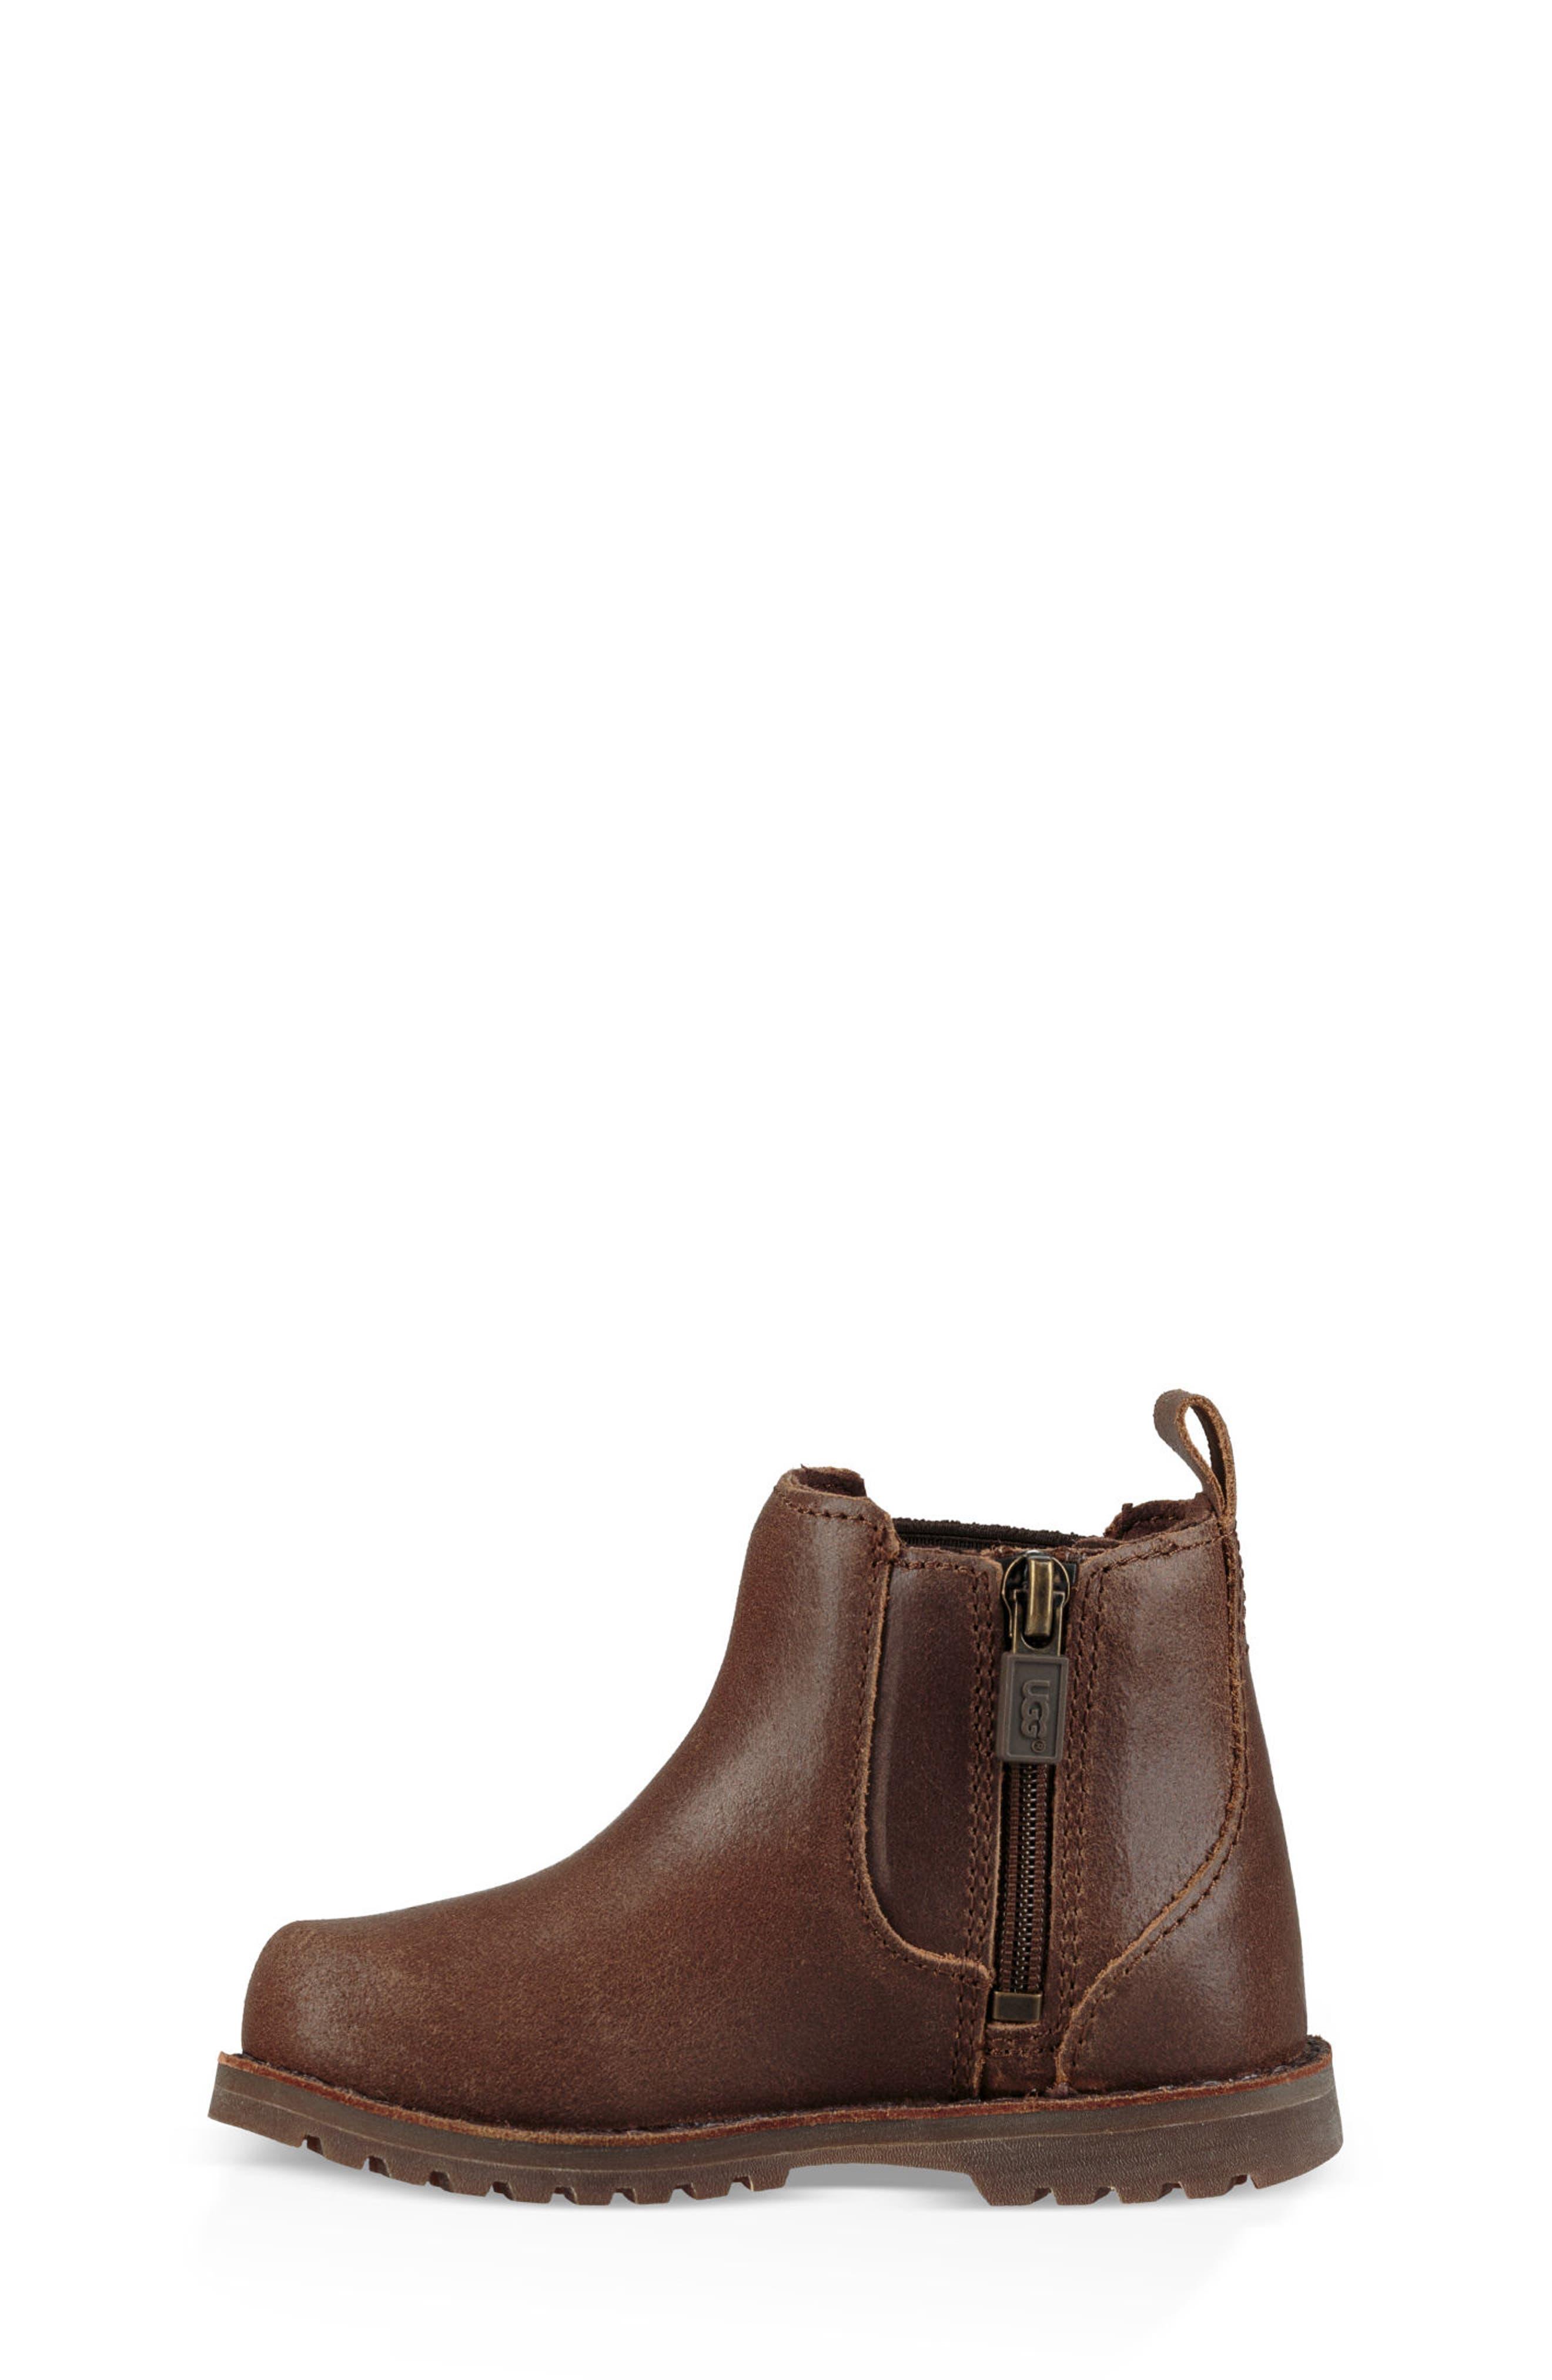 Callum Water Resistant Chelsea Boot,                             Alternate thumbnail 2, color,                             Chocolate Brown